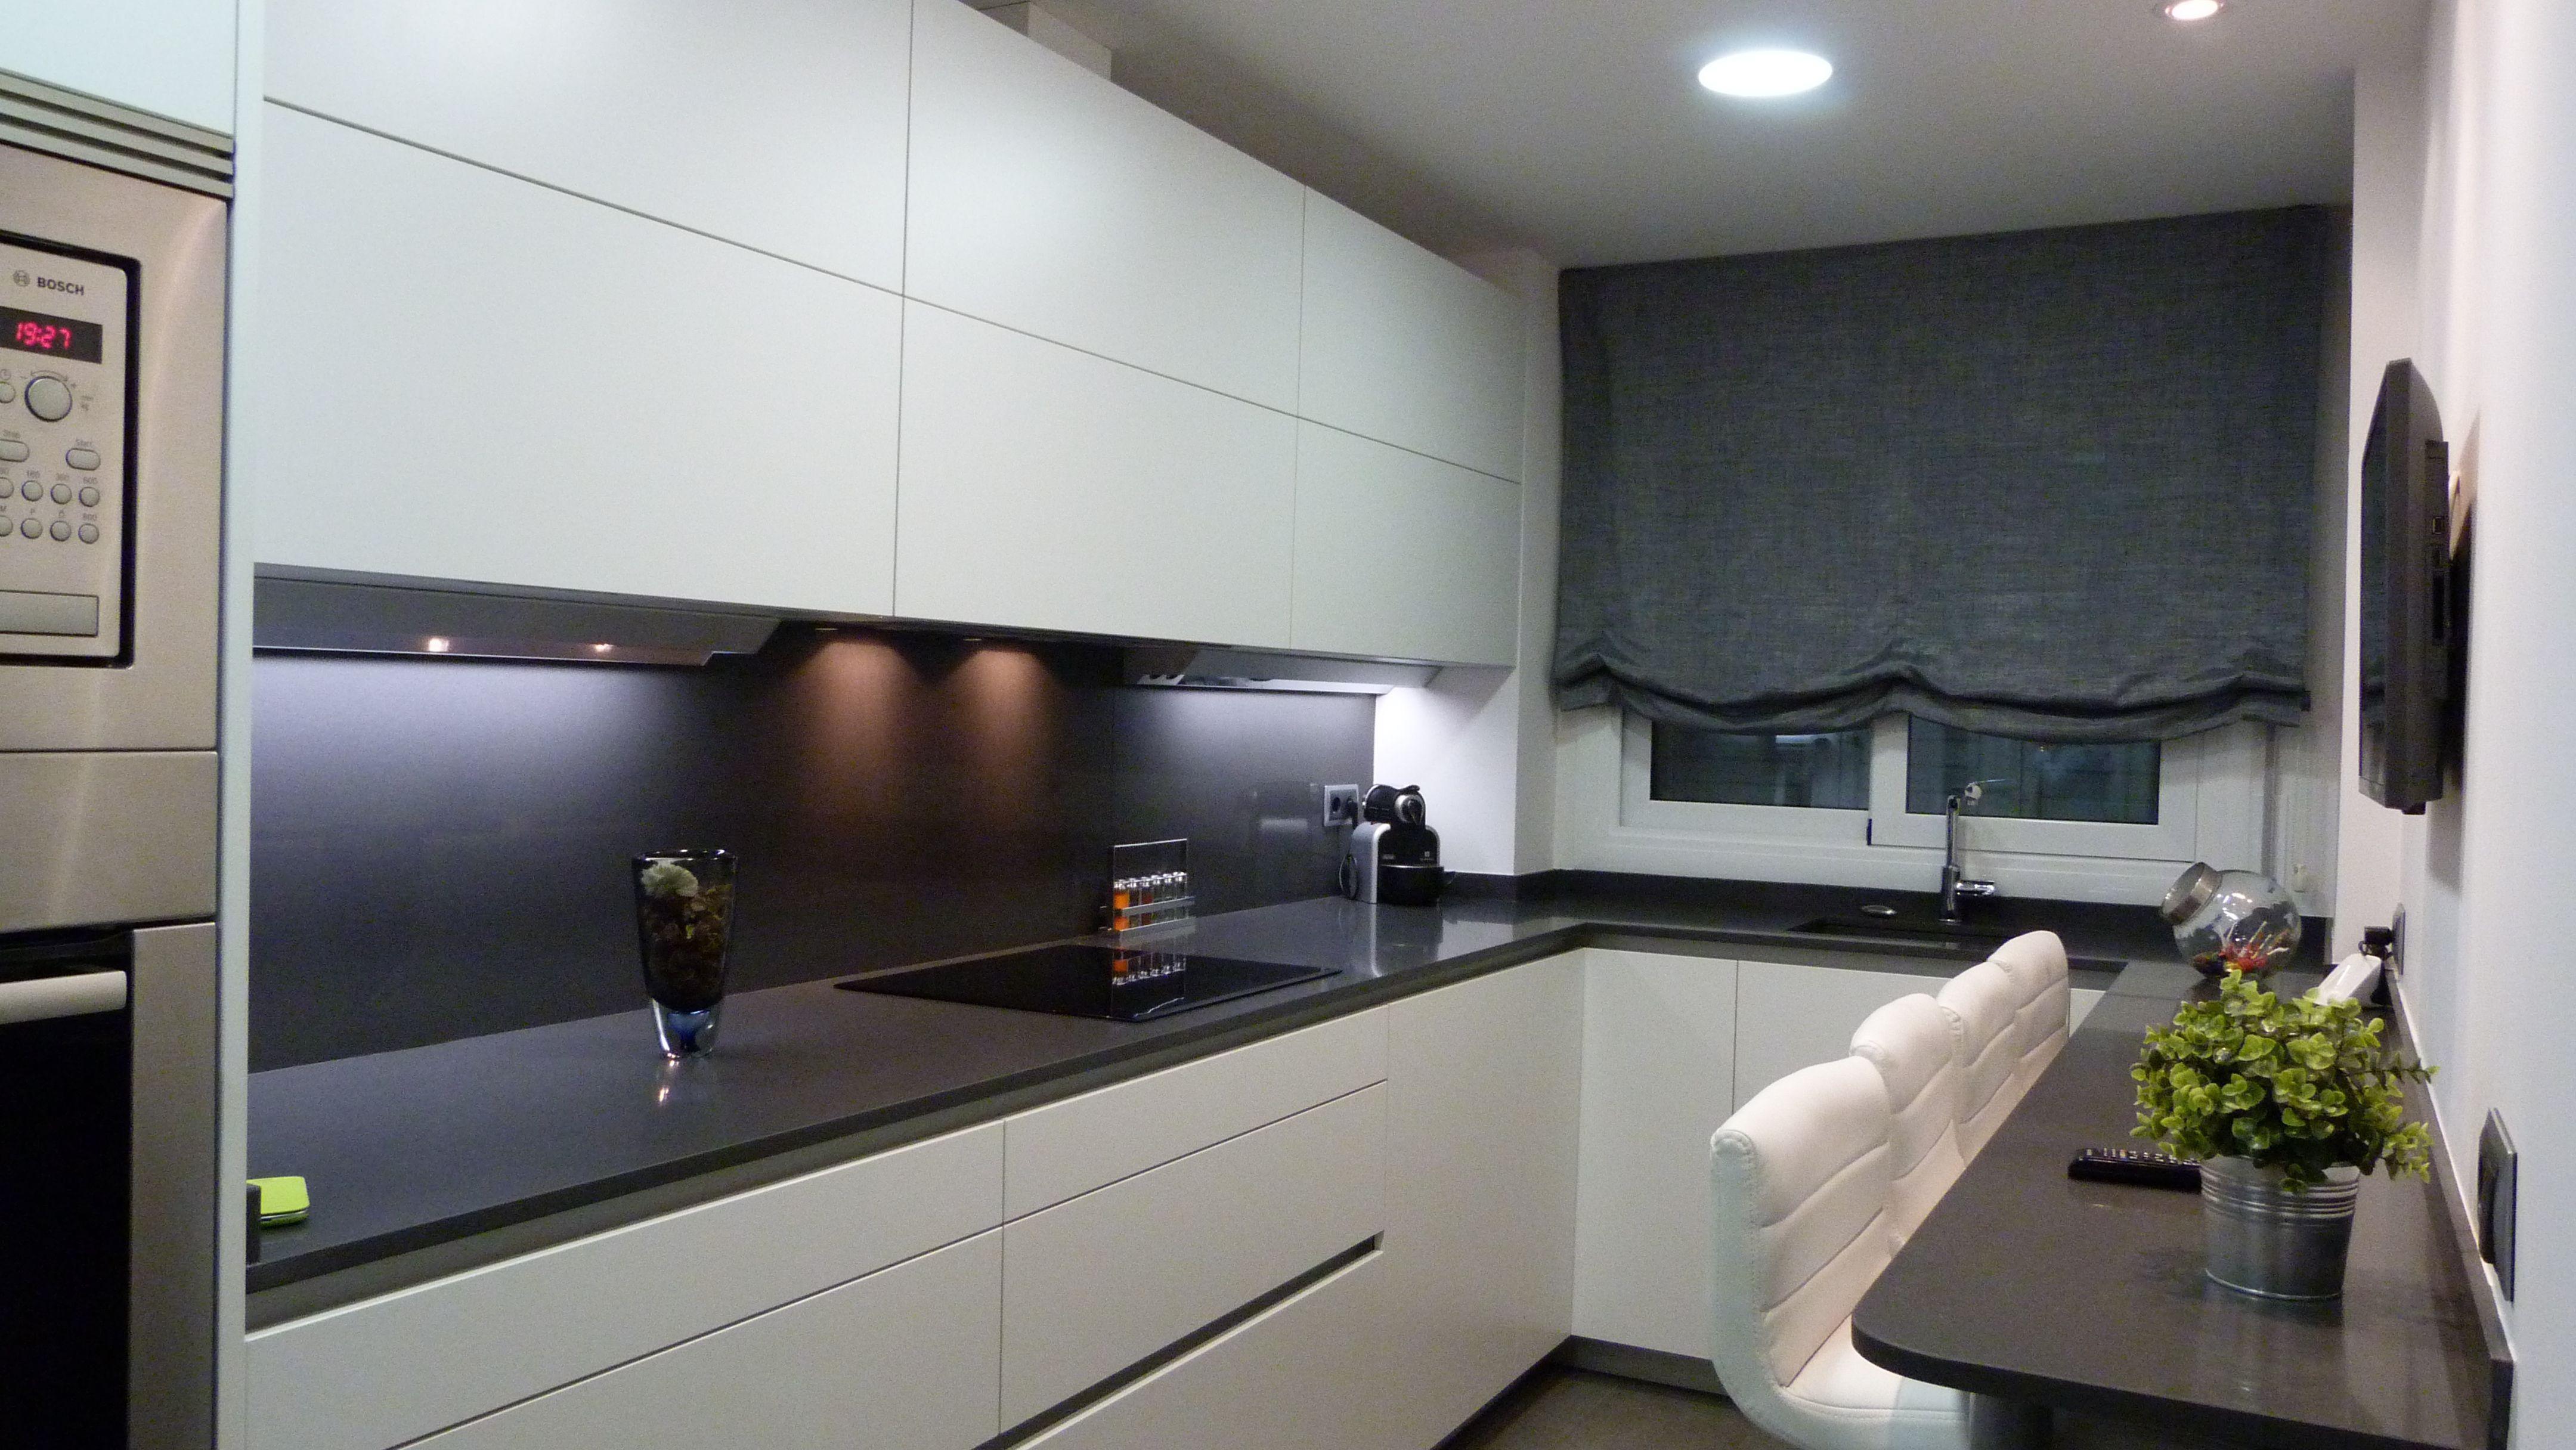 Reforma cocina E&R. Mobiliario Santos, modelo Line-E blanco mate. Silestone Marengo.  #Grupo filtrante #barra #taburetes #blanco #white